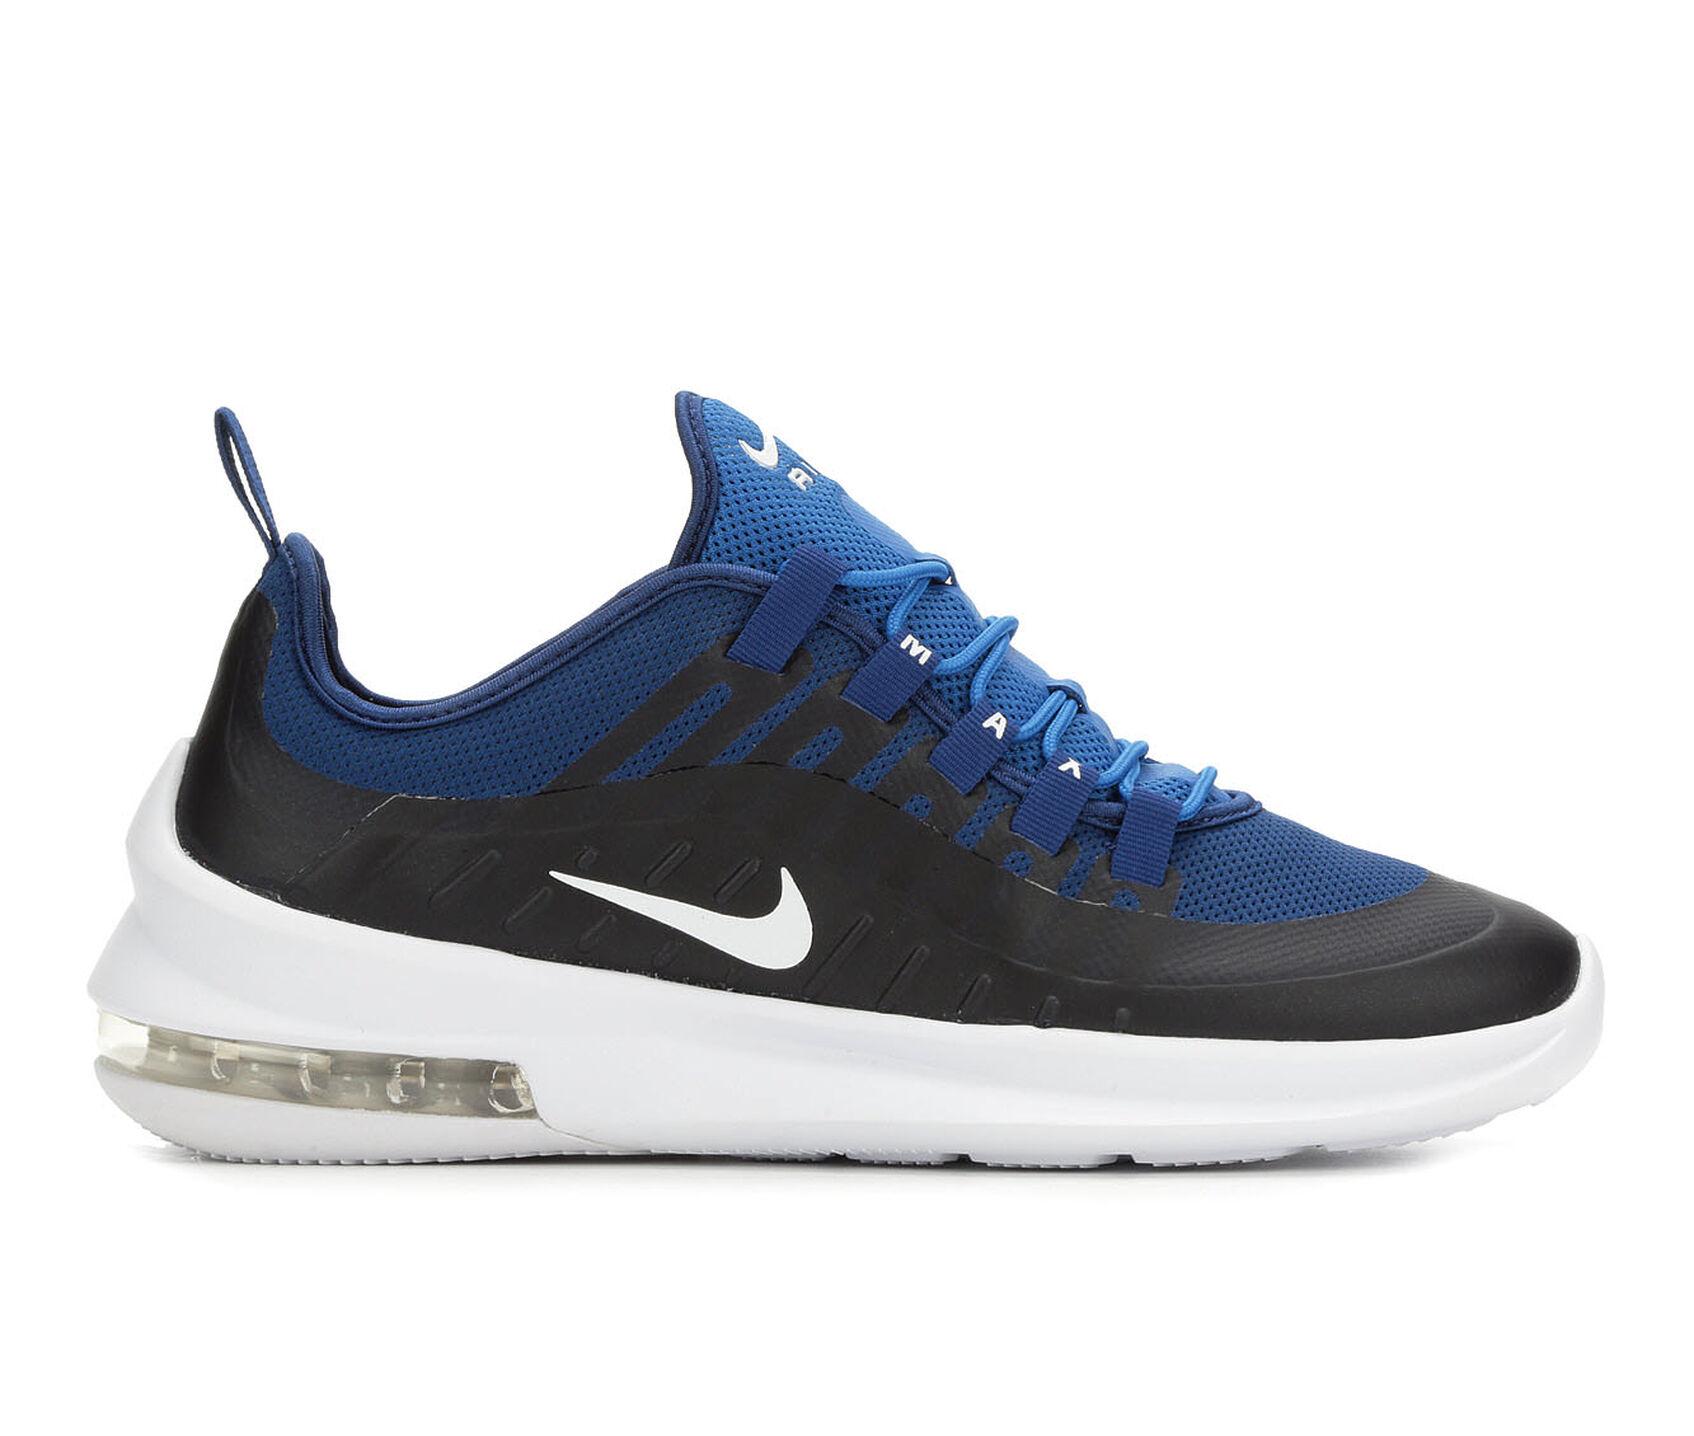 88c45ea789d1 Men's Nike Air Max Axis Running Shoes